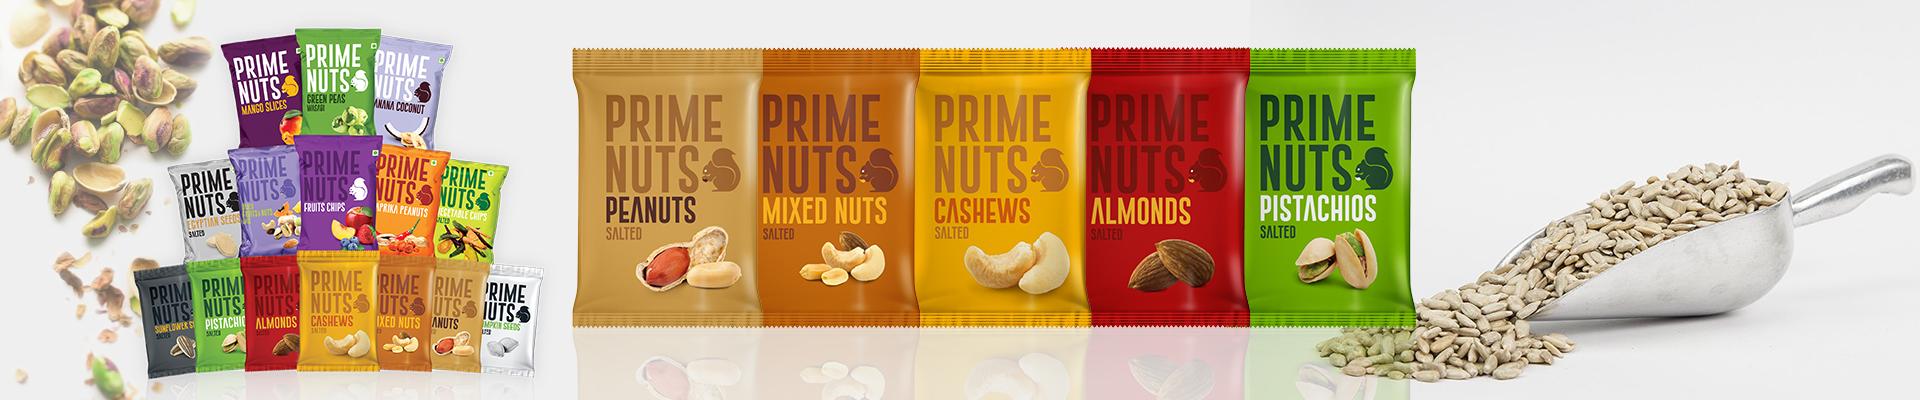 Prime Nuts Online Store | Premium Quality Nuts in UAE